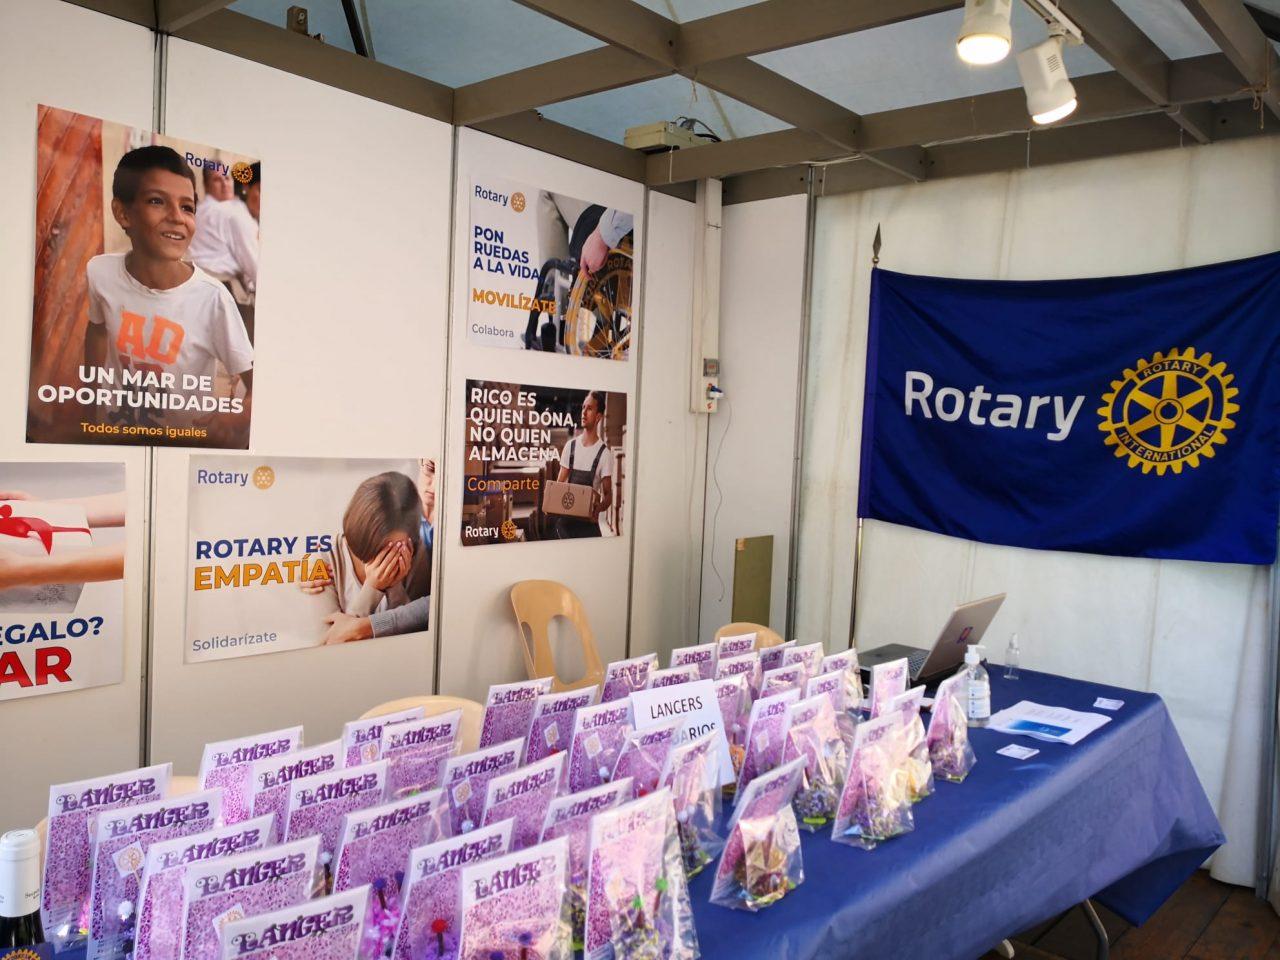 Rotary-1280x960.jpg